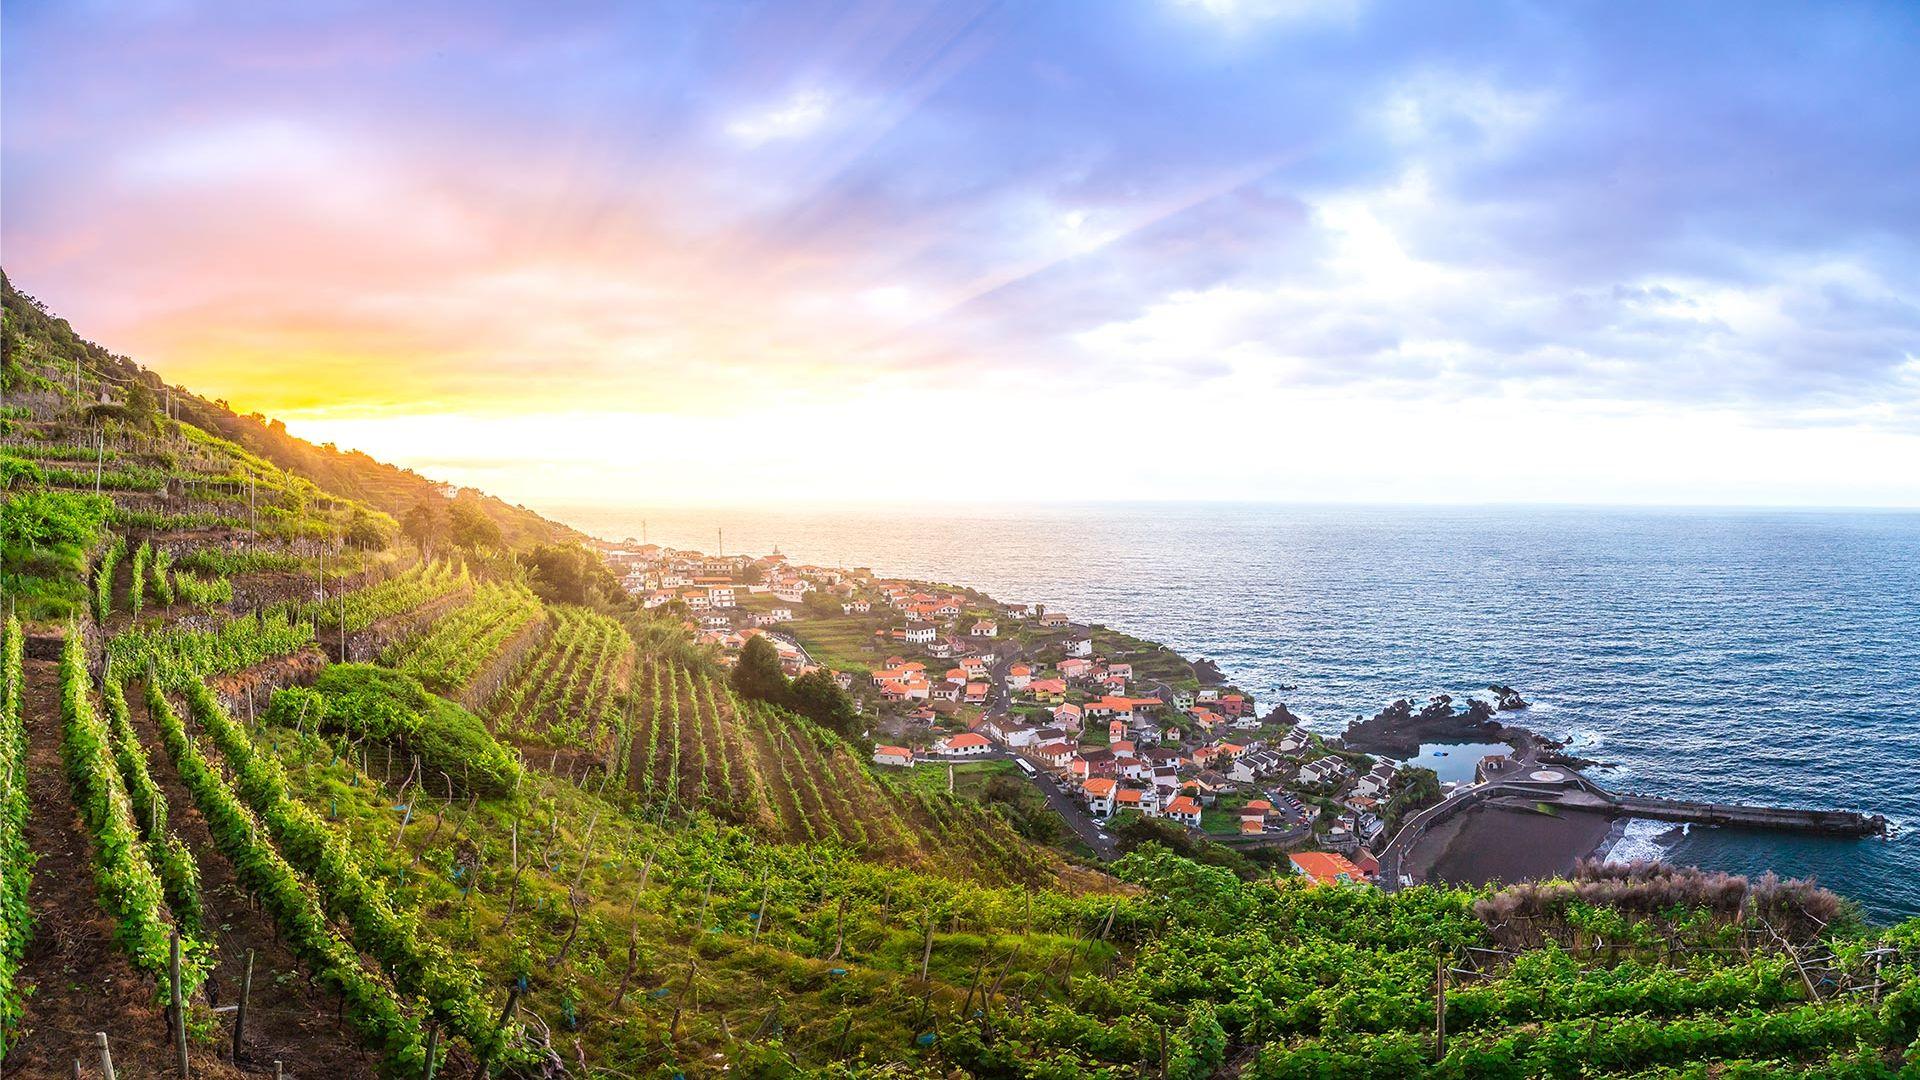 Sejur plaja Savoy Signature Madeira, 8 zile - 4 septembrie 2021